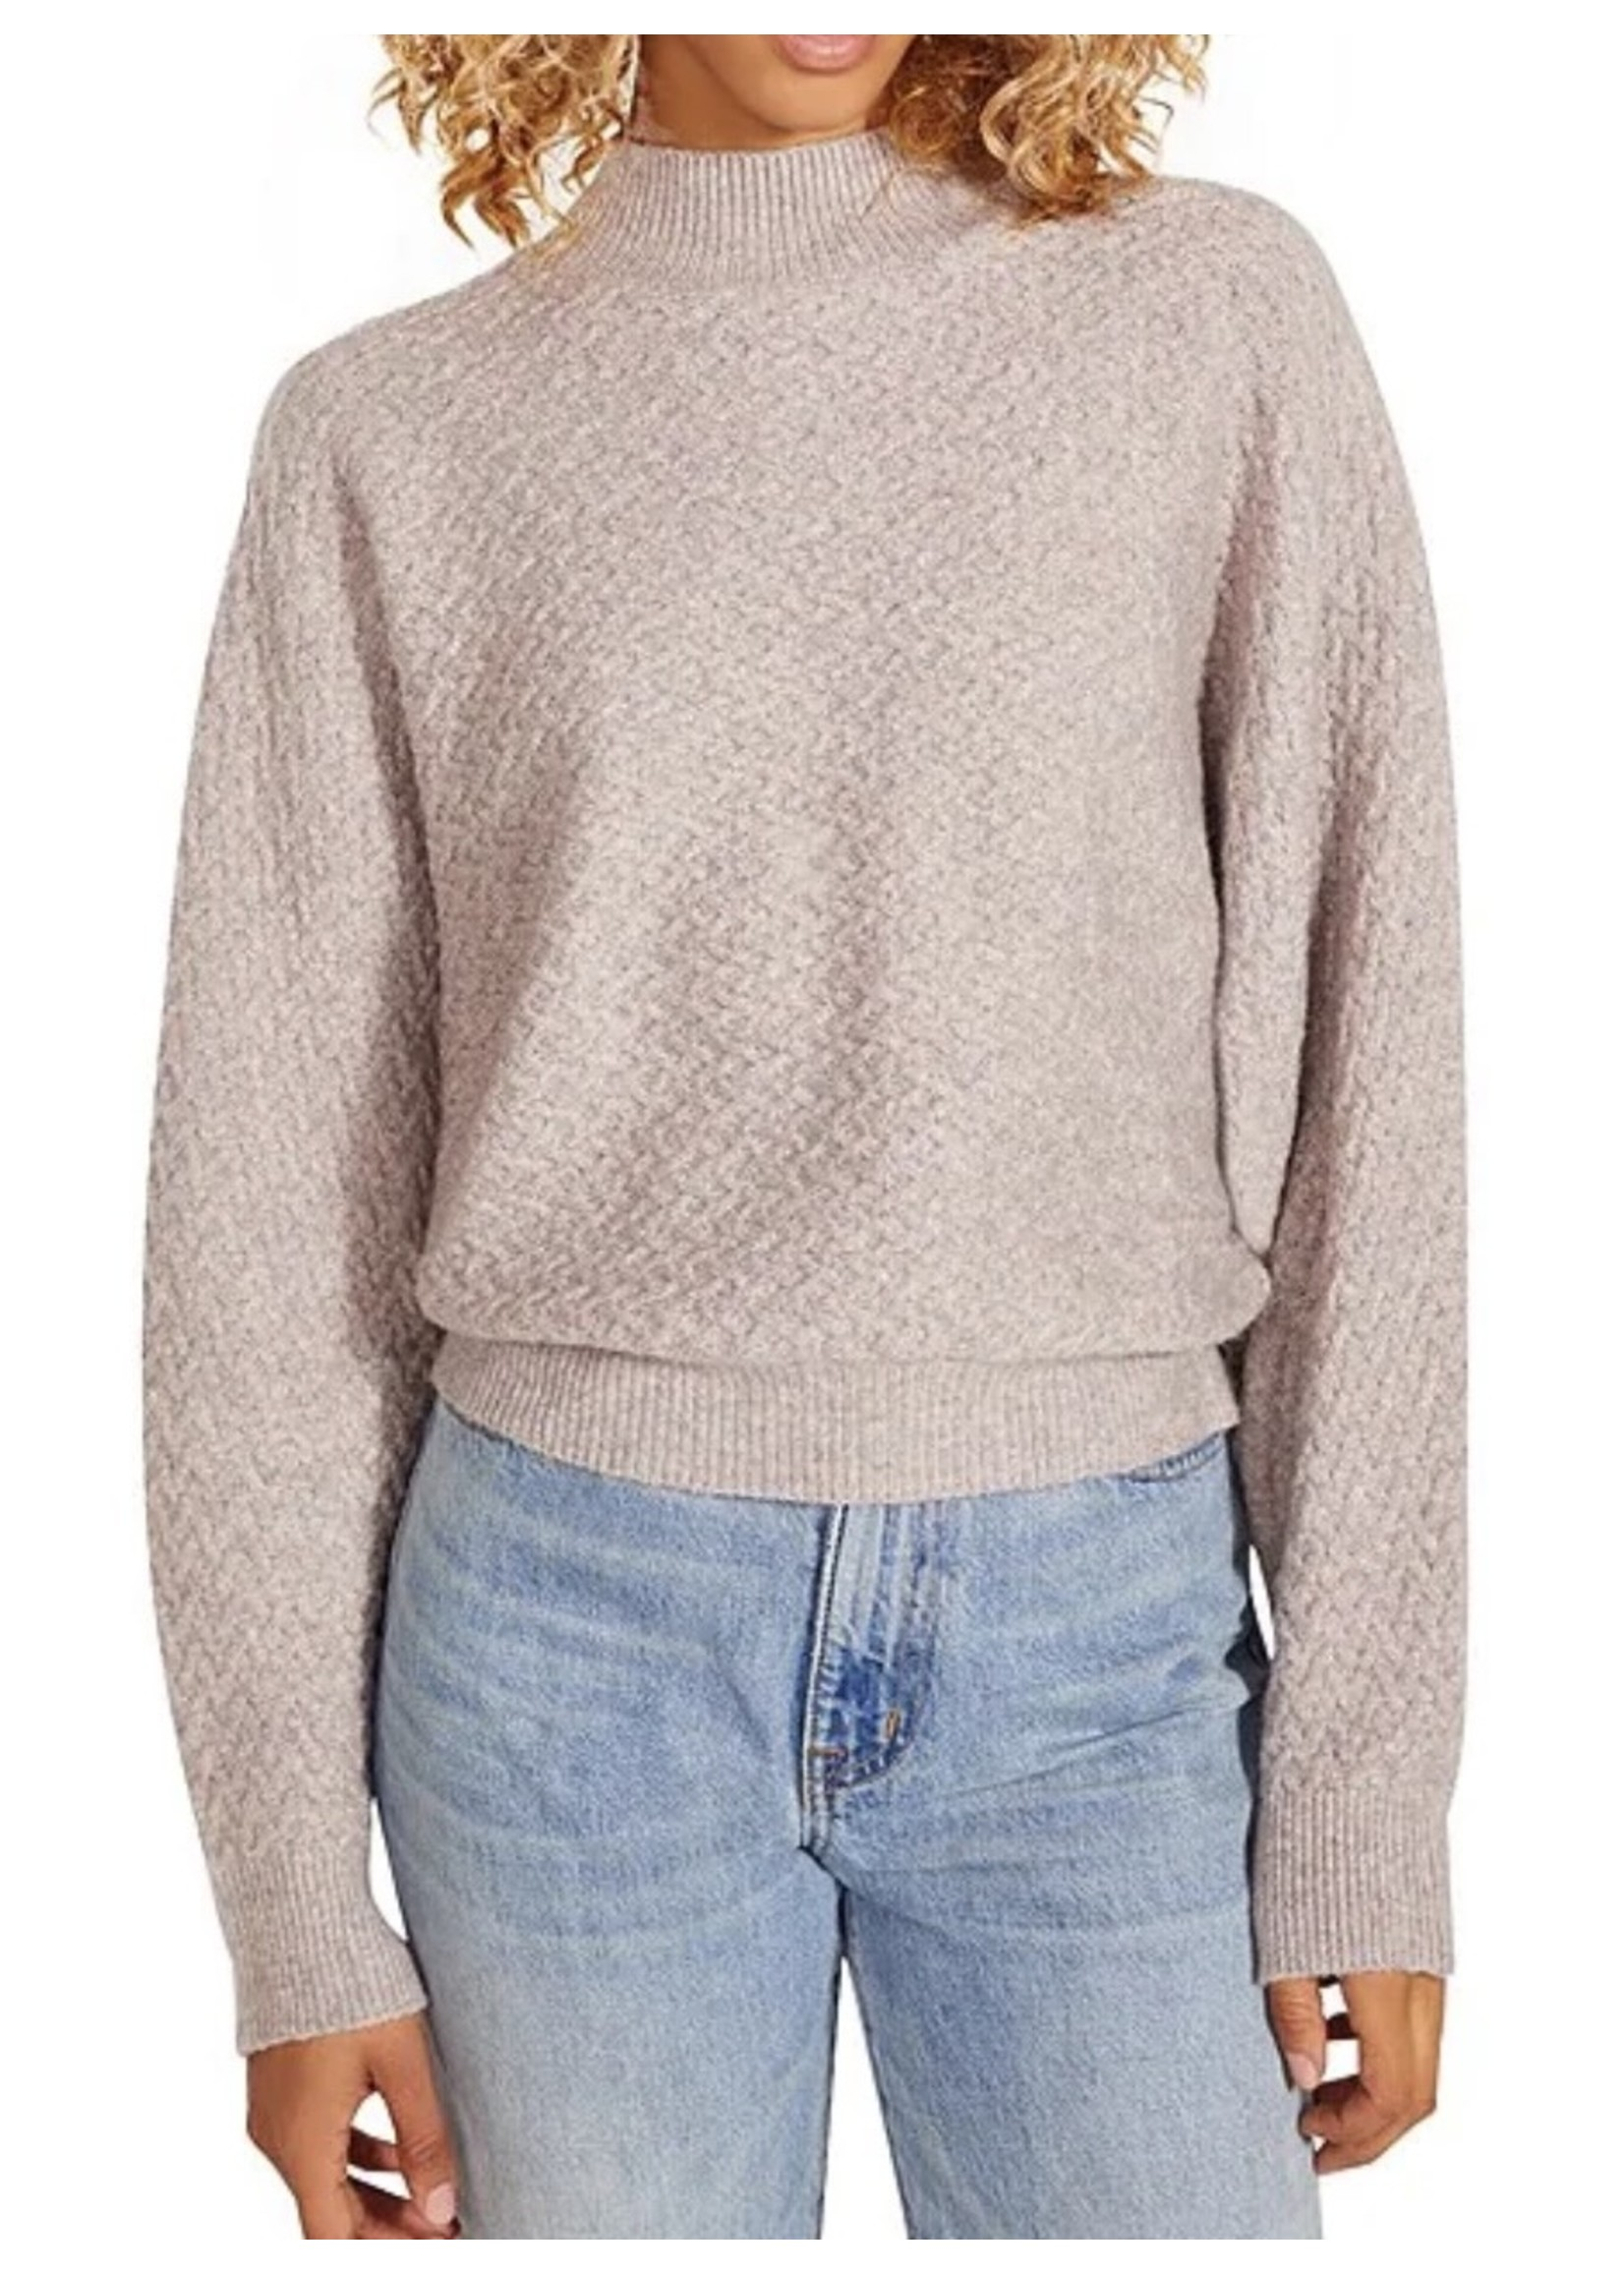 BB Dakota Wing The Alarm Sweater - BL306043